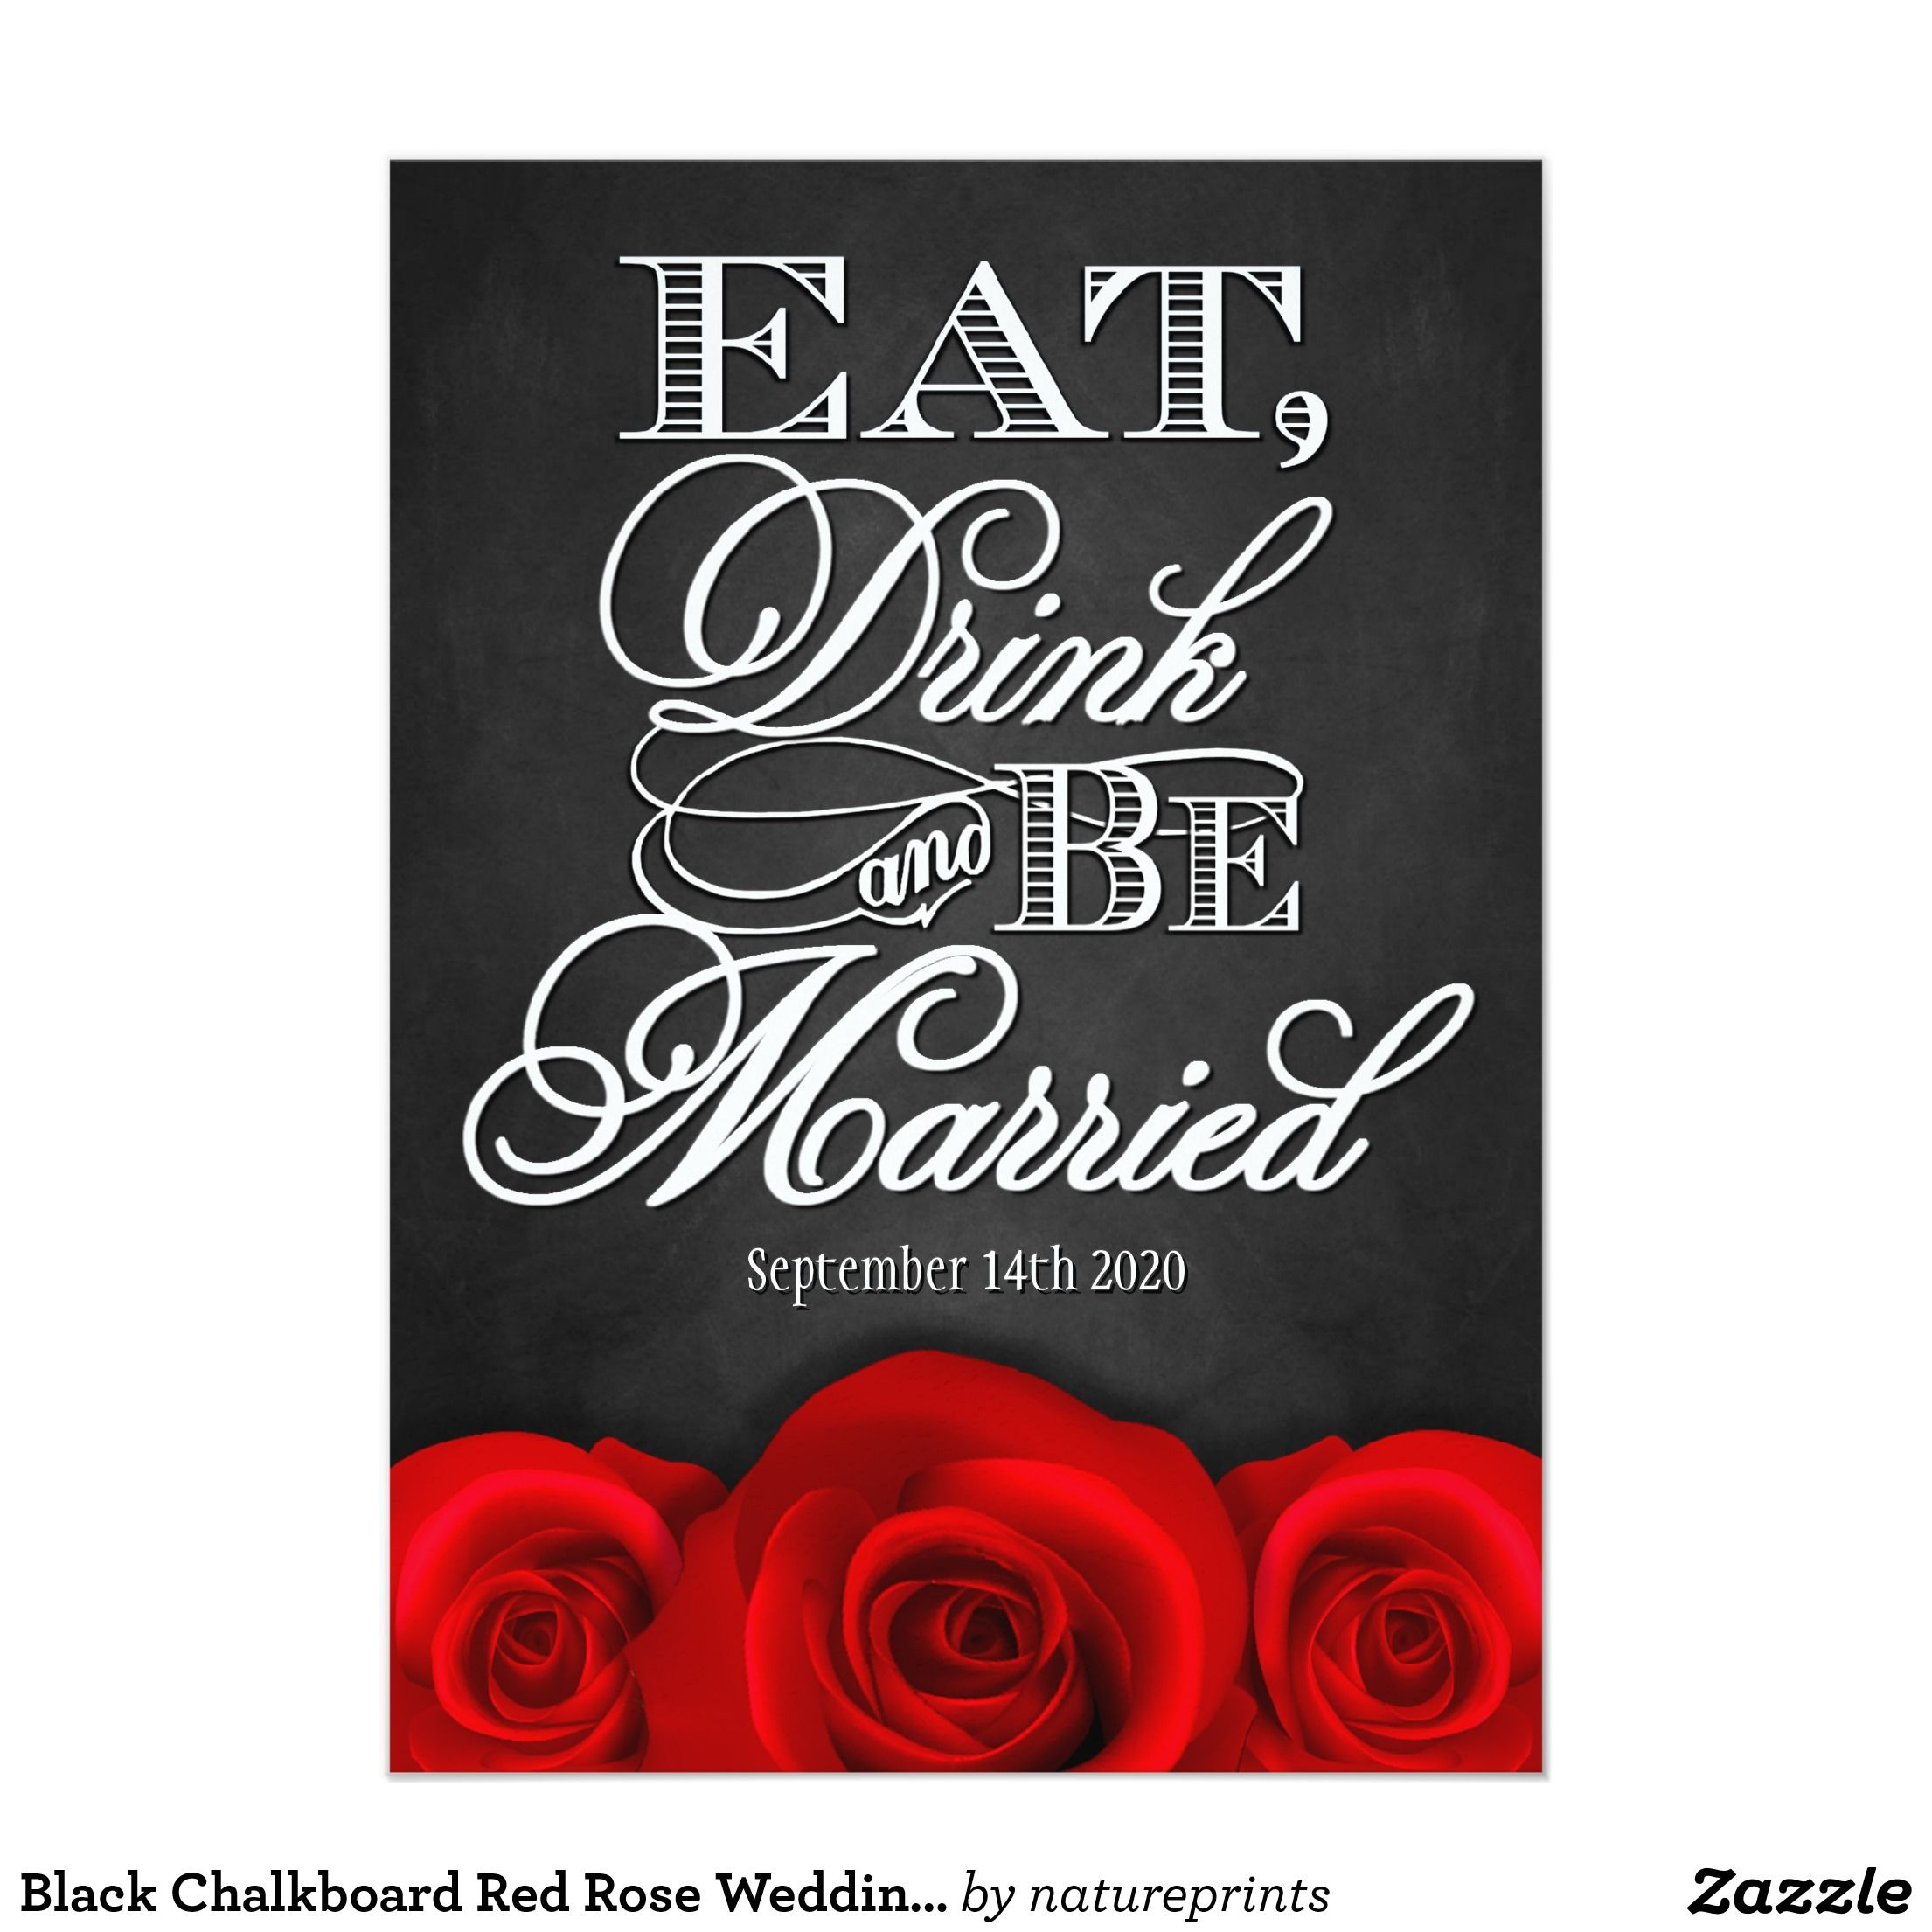 Black Chalkboard Red Rose Wedding Invitations | Black chalkboard ...